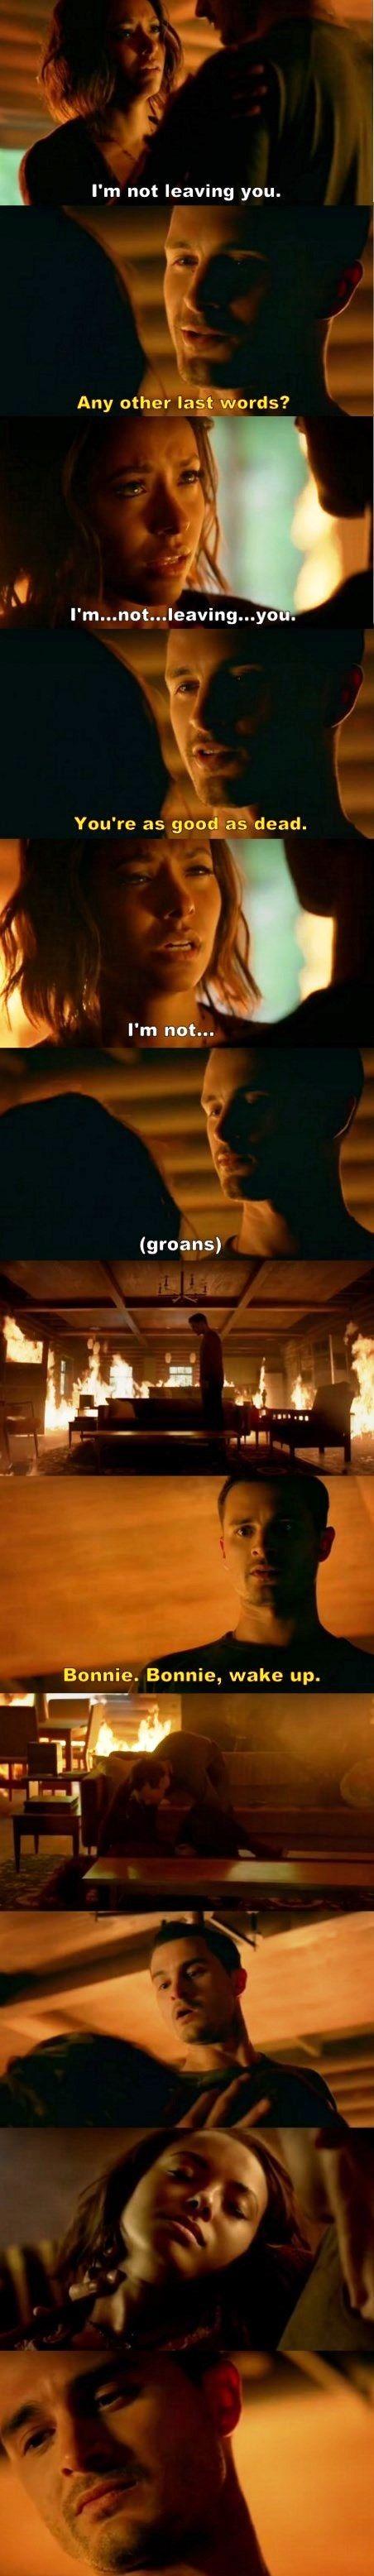 The Vampire Diaries TVD S08E05 - Bonnie & Enzo